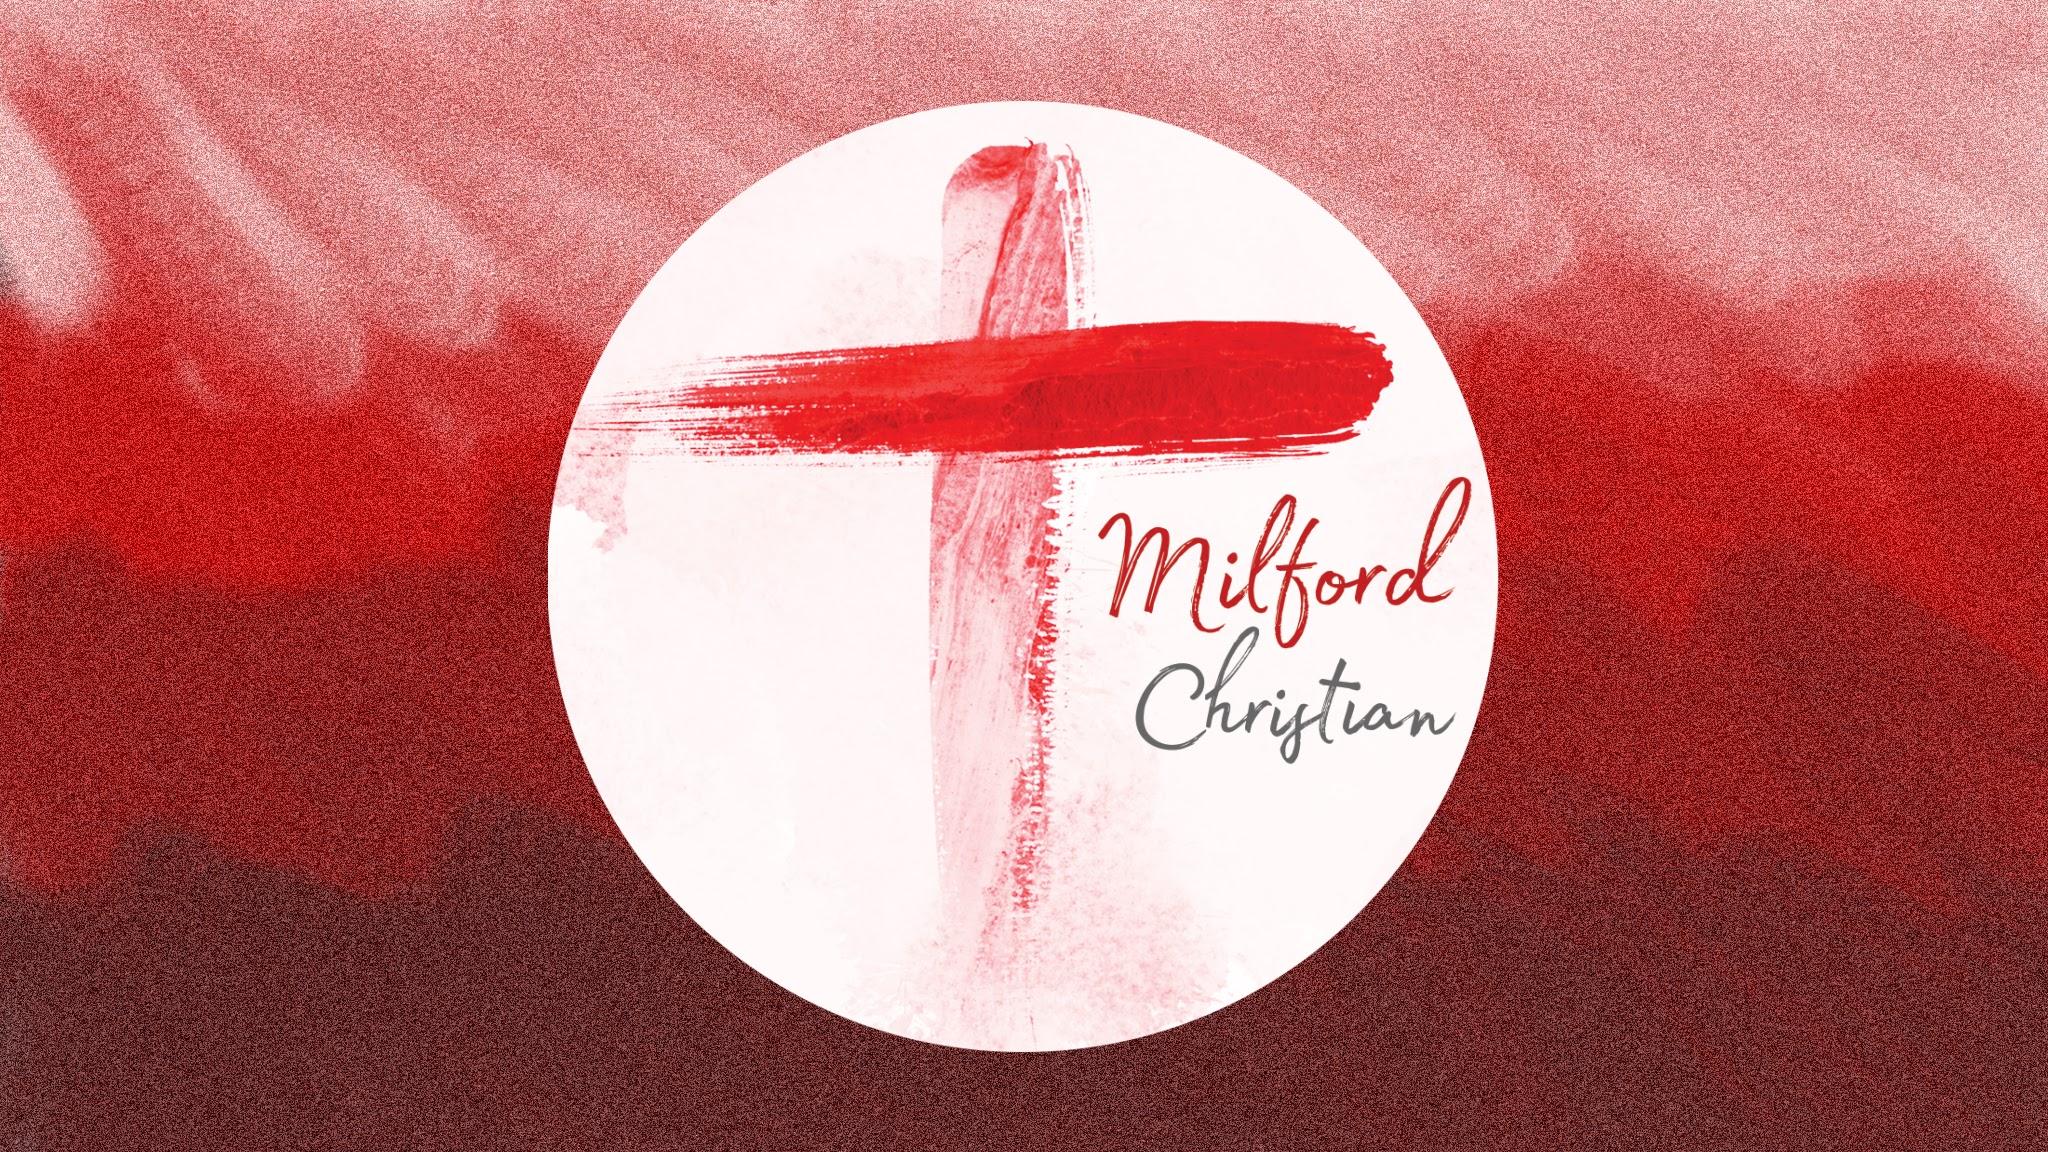 Milford Christian Church, KY